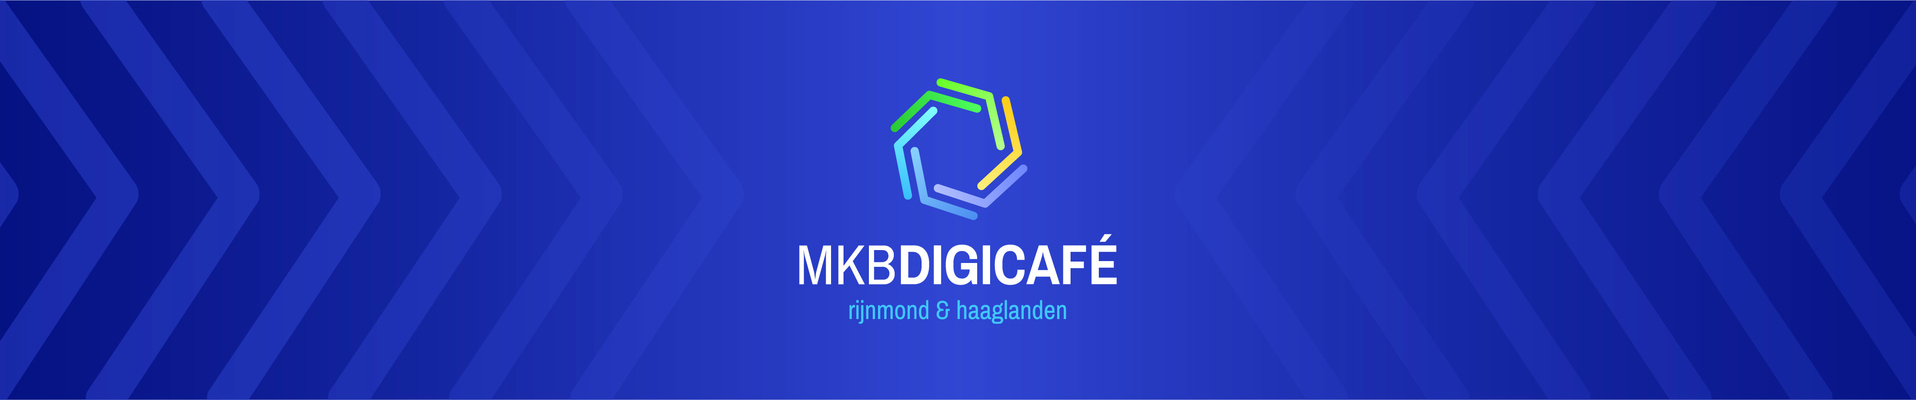 MKB Digicafé: Online & Social Marketing